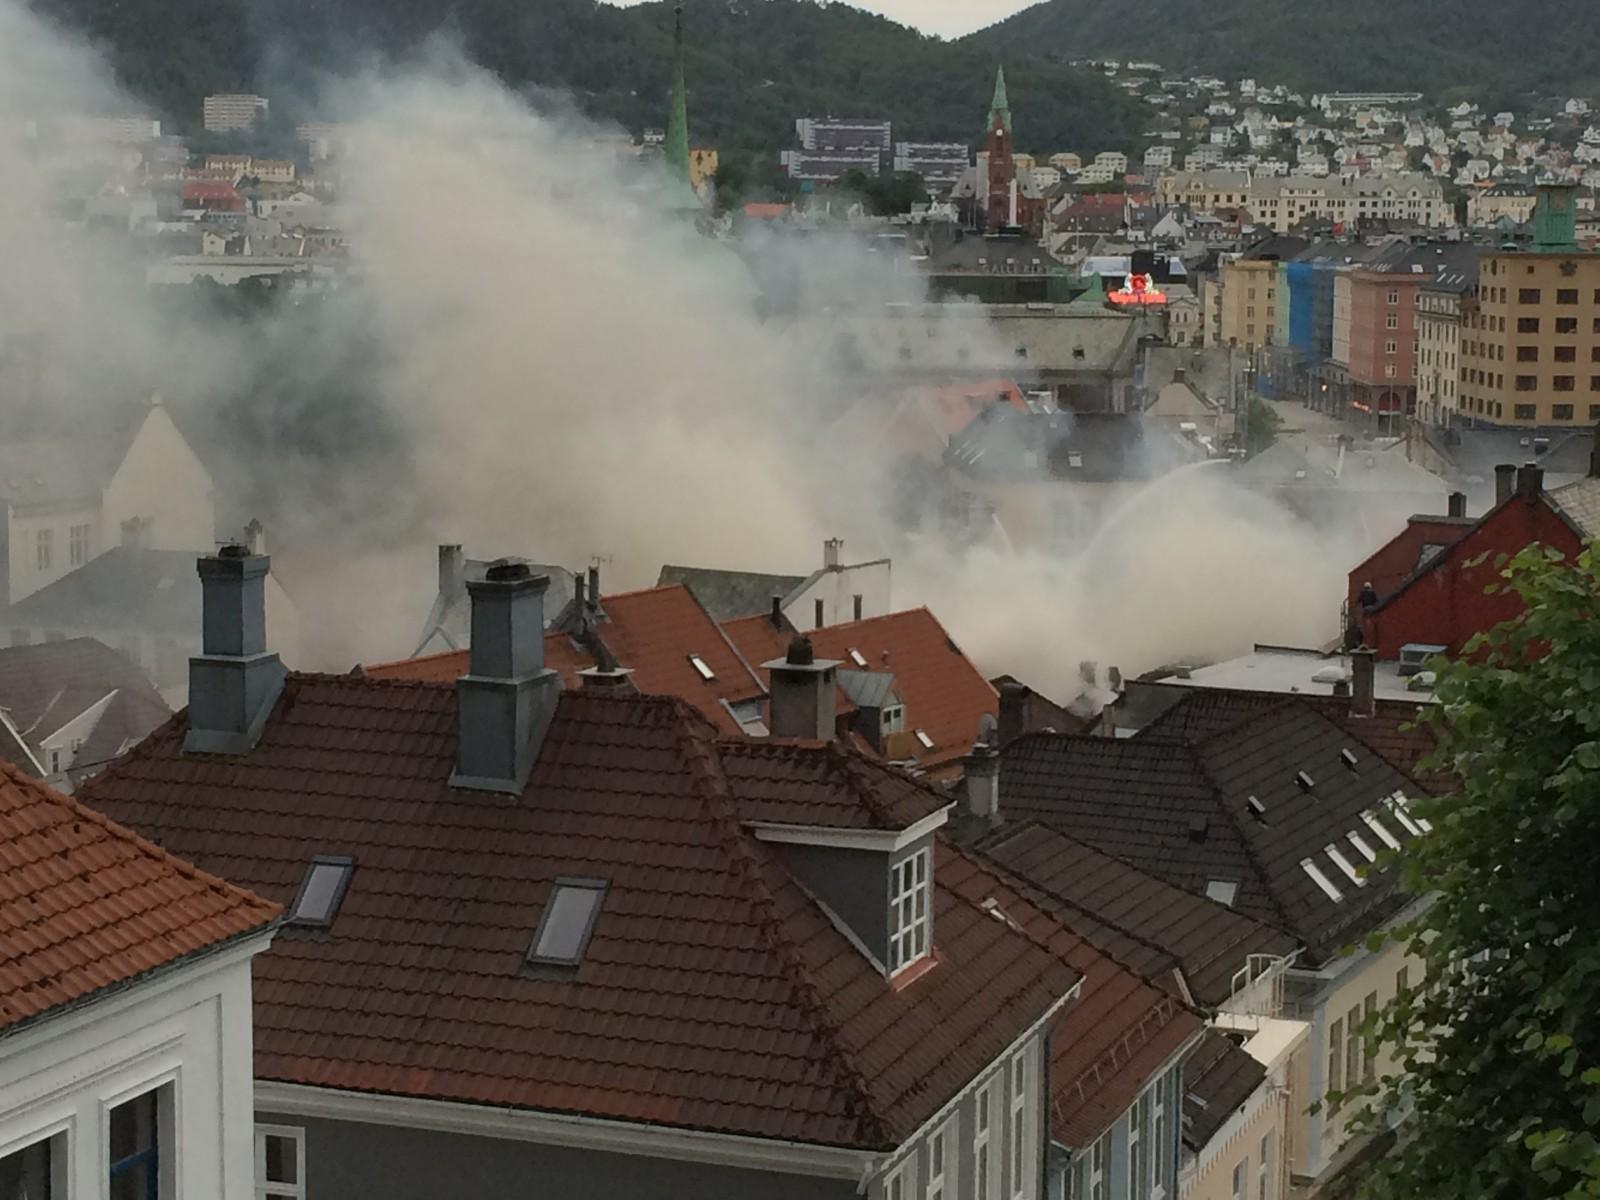 Området der det brenner defineres som et såkalt brannsmitteområde.